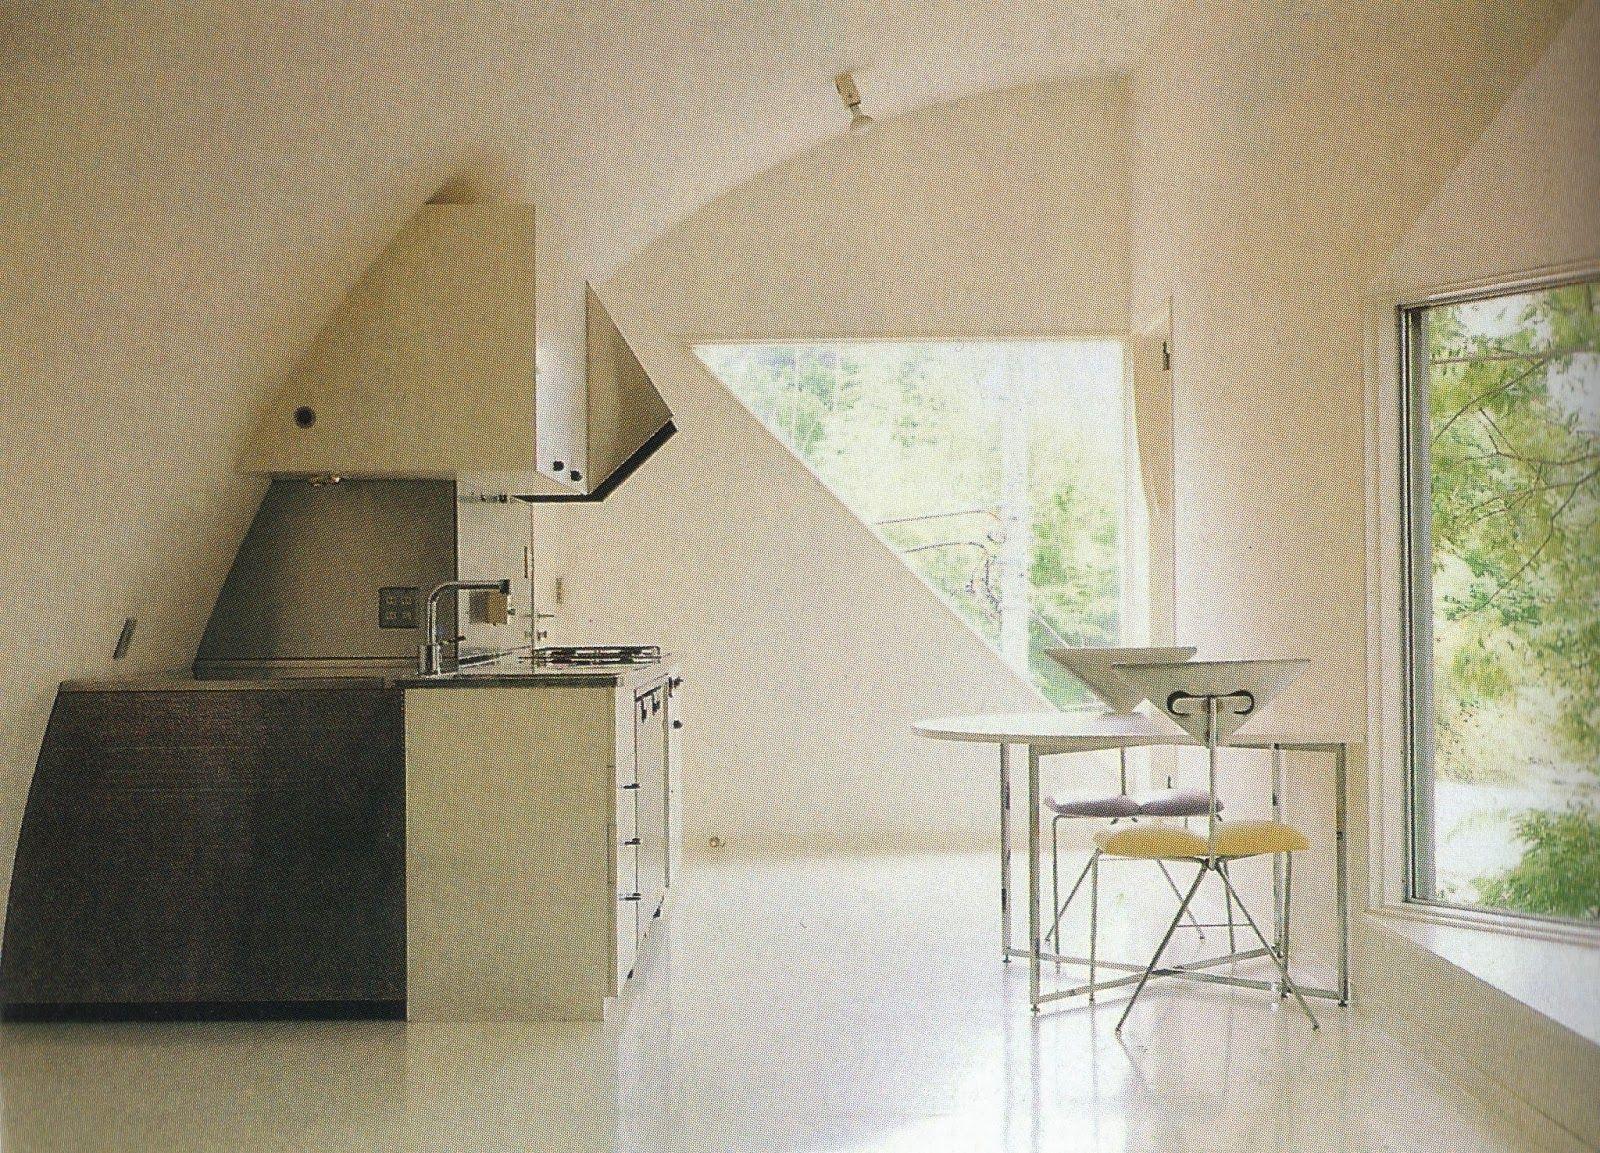 House in Yokohama - Casa en Yokohama ~ Arquitectura asombrosa